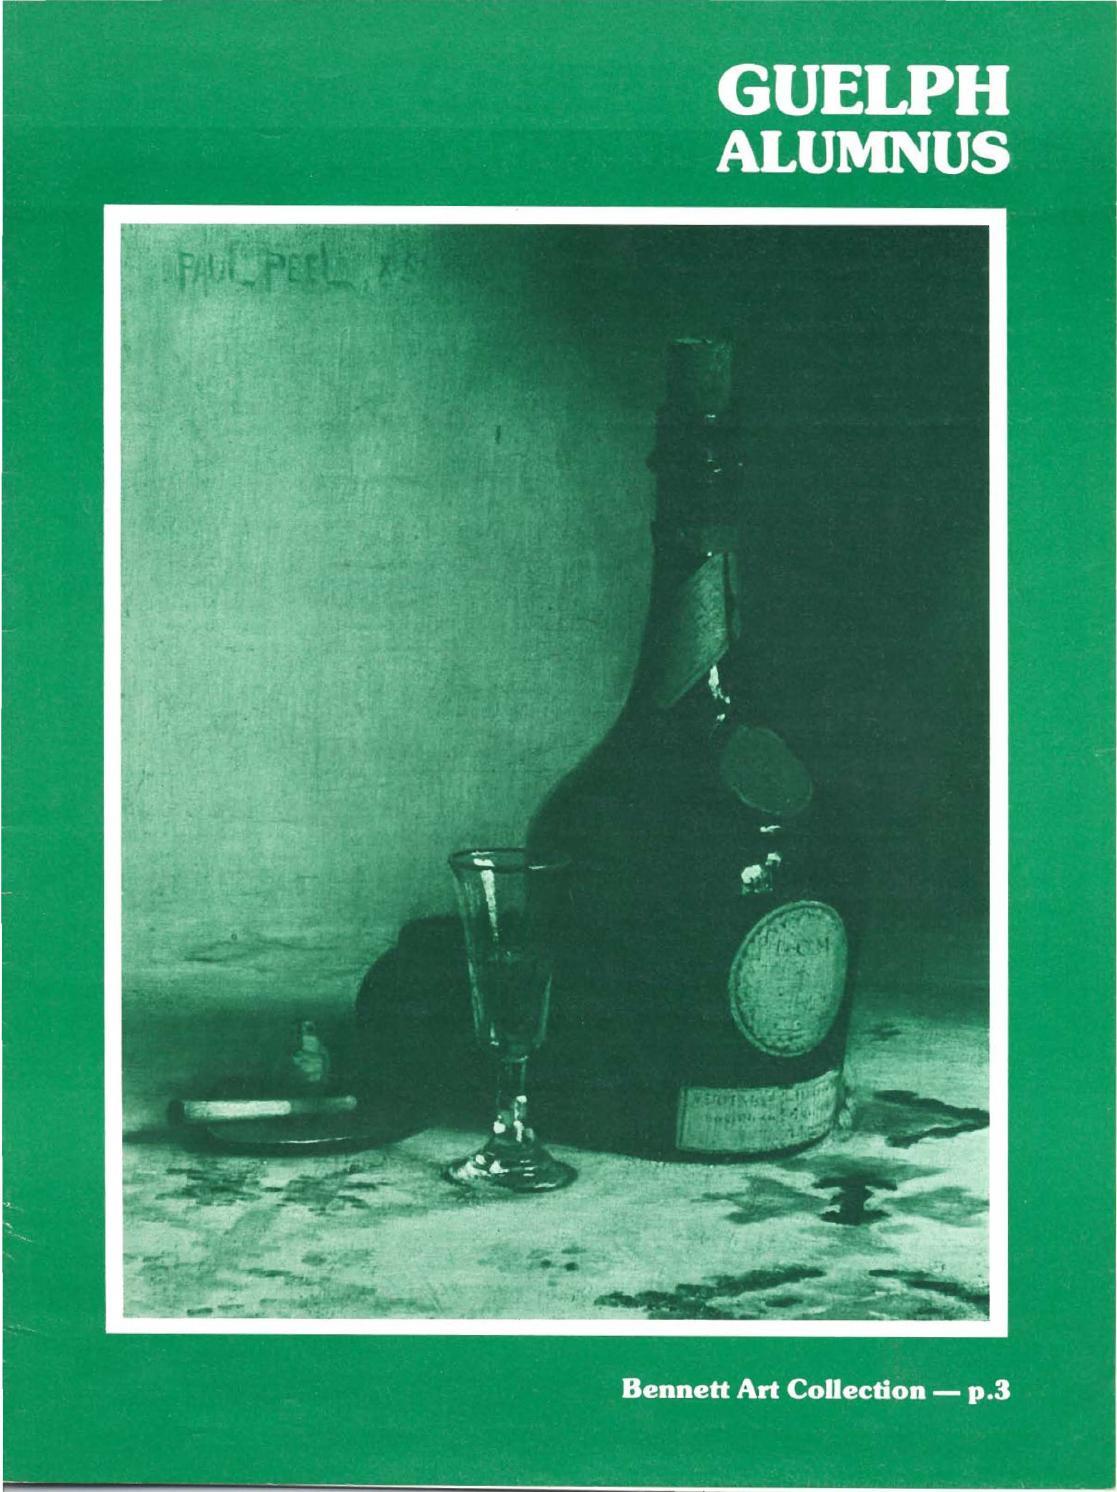 Guelph Alumnus Magazine, Fall 1983 by University of Guelph - issuu